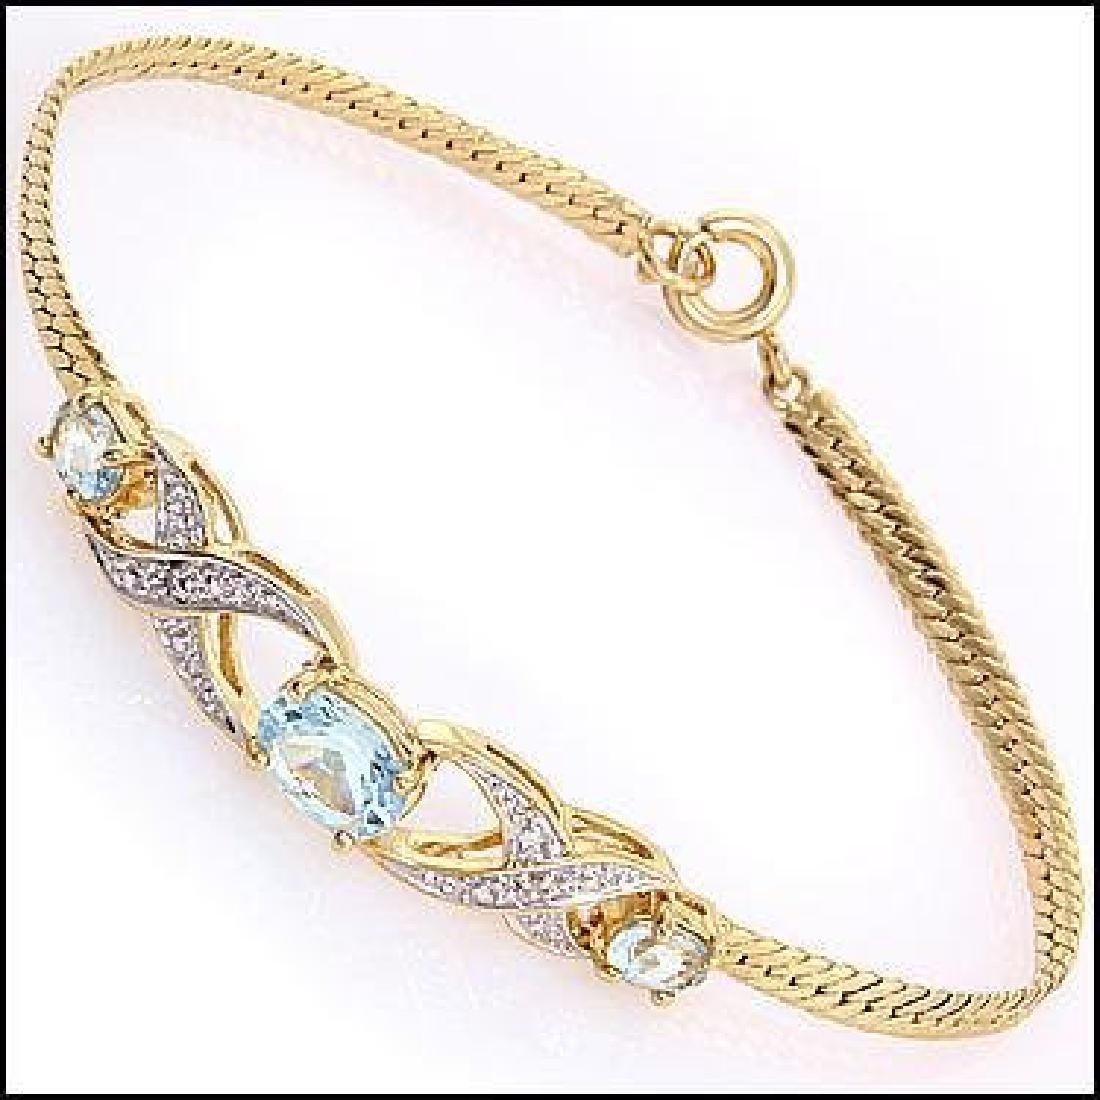 3.89 CT Blue Topaz & Diamond Designer Bracelet $965